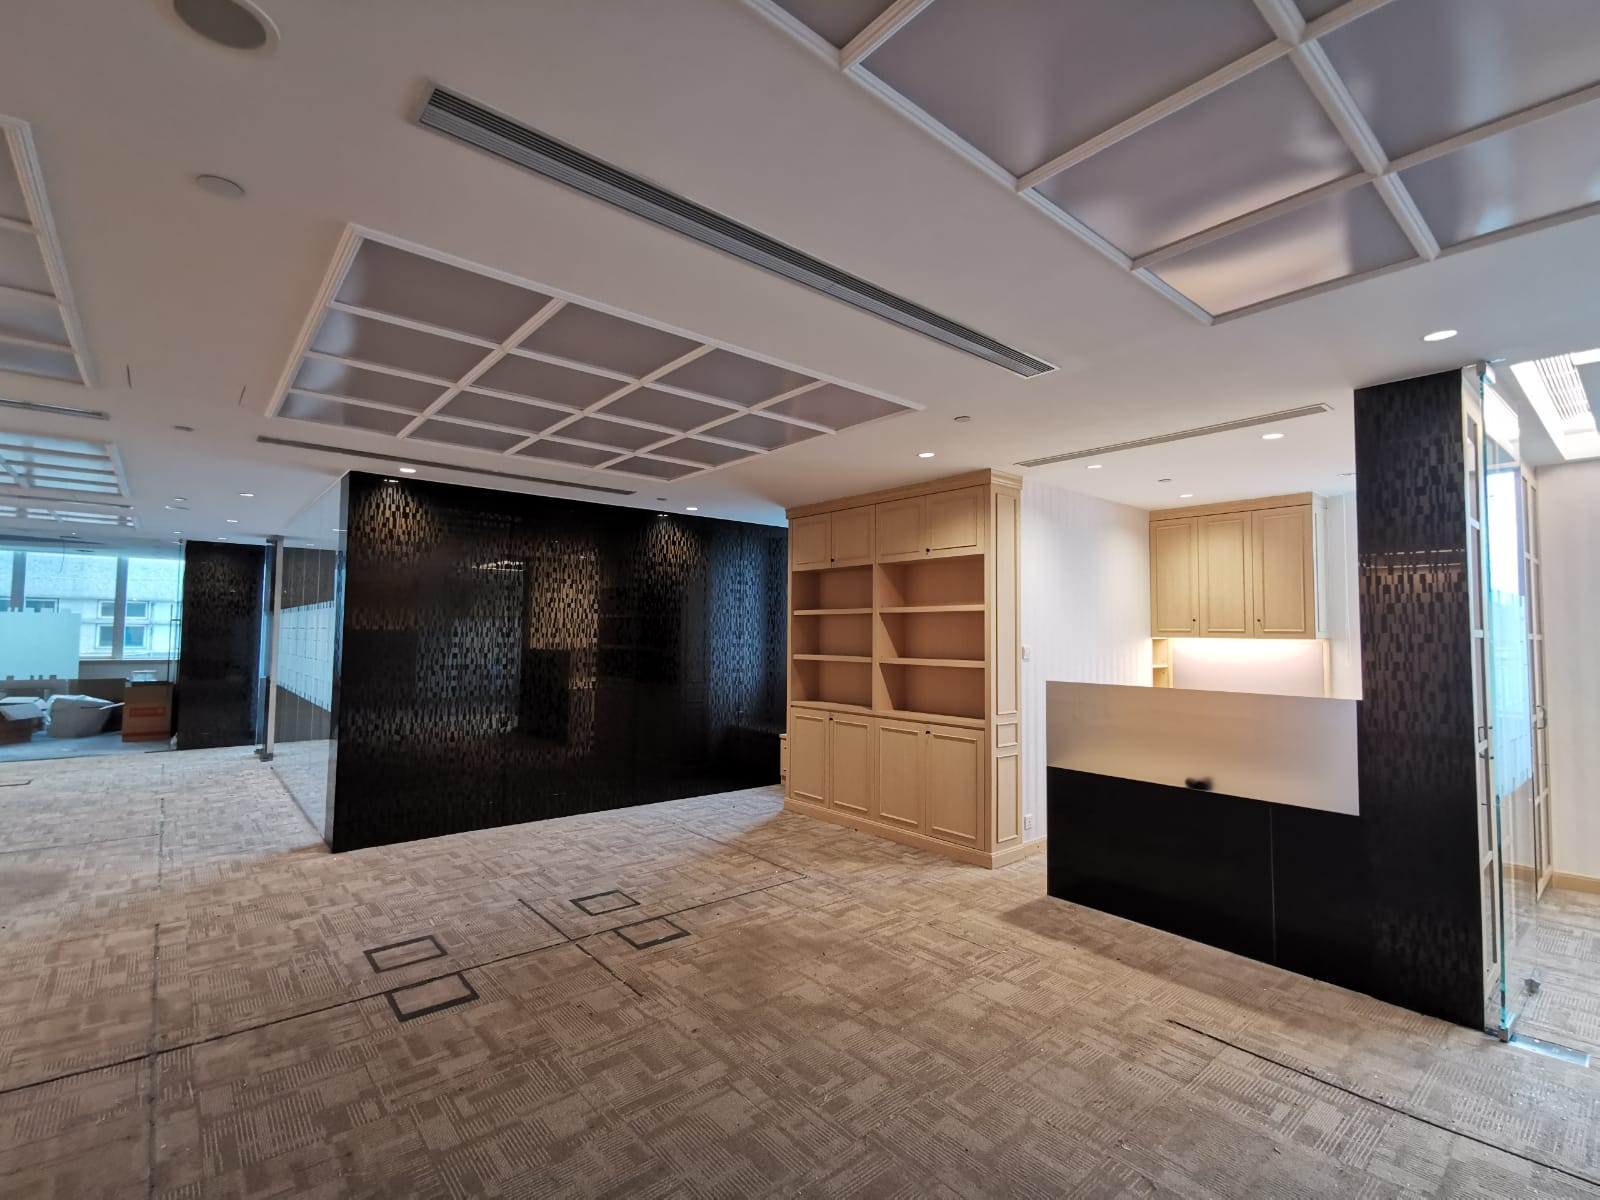 Middle level whole floor, 9 Des Voeux Road West, Sheung Wan